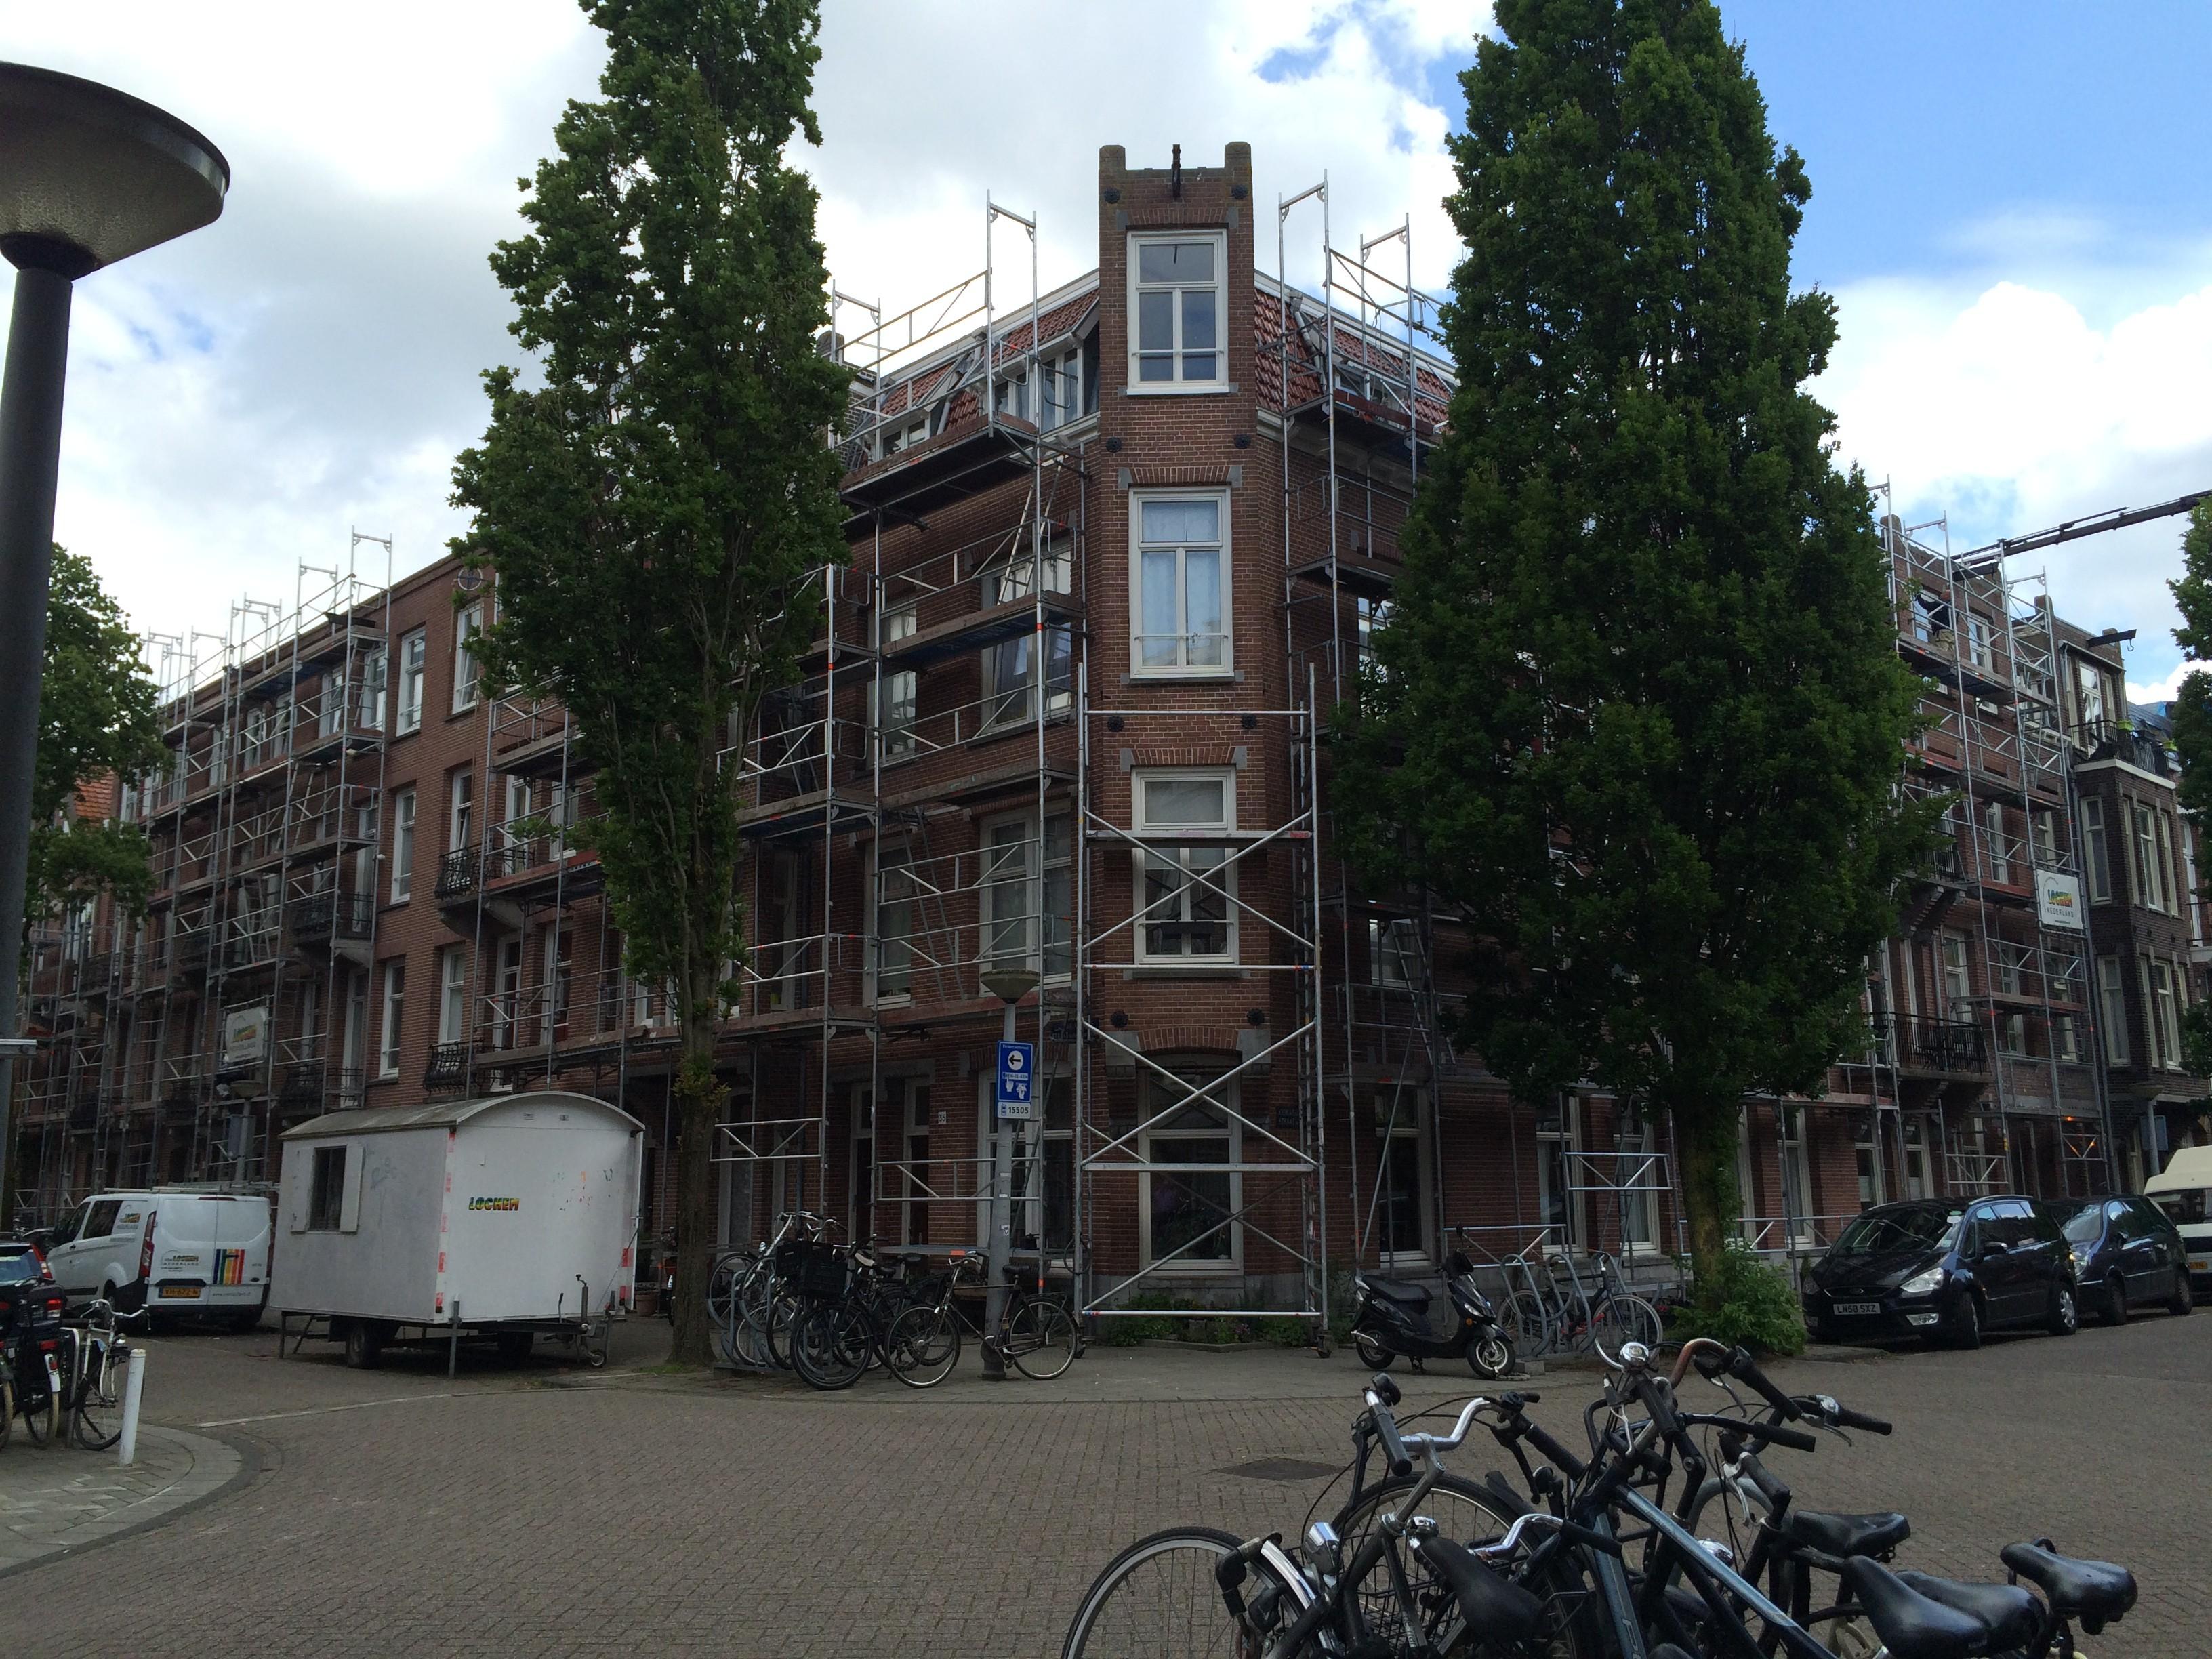 BKT_Amsterdam_VvE_gevel_onderhoud_houtrot_deelvervanging_schilderwerk_van_lochem_01.jpg